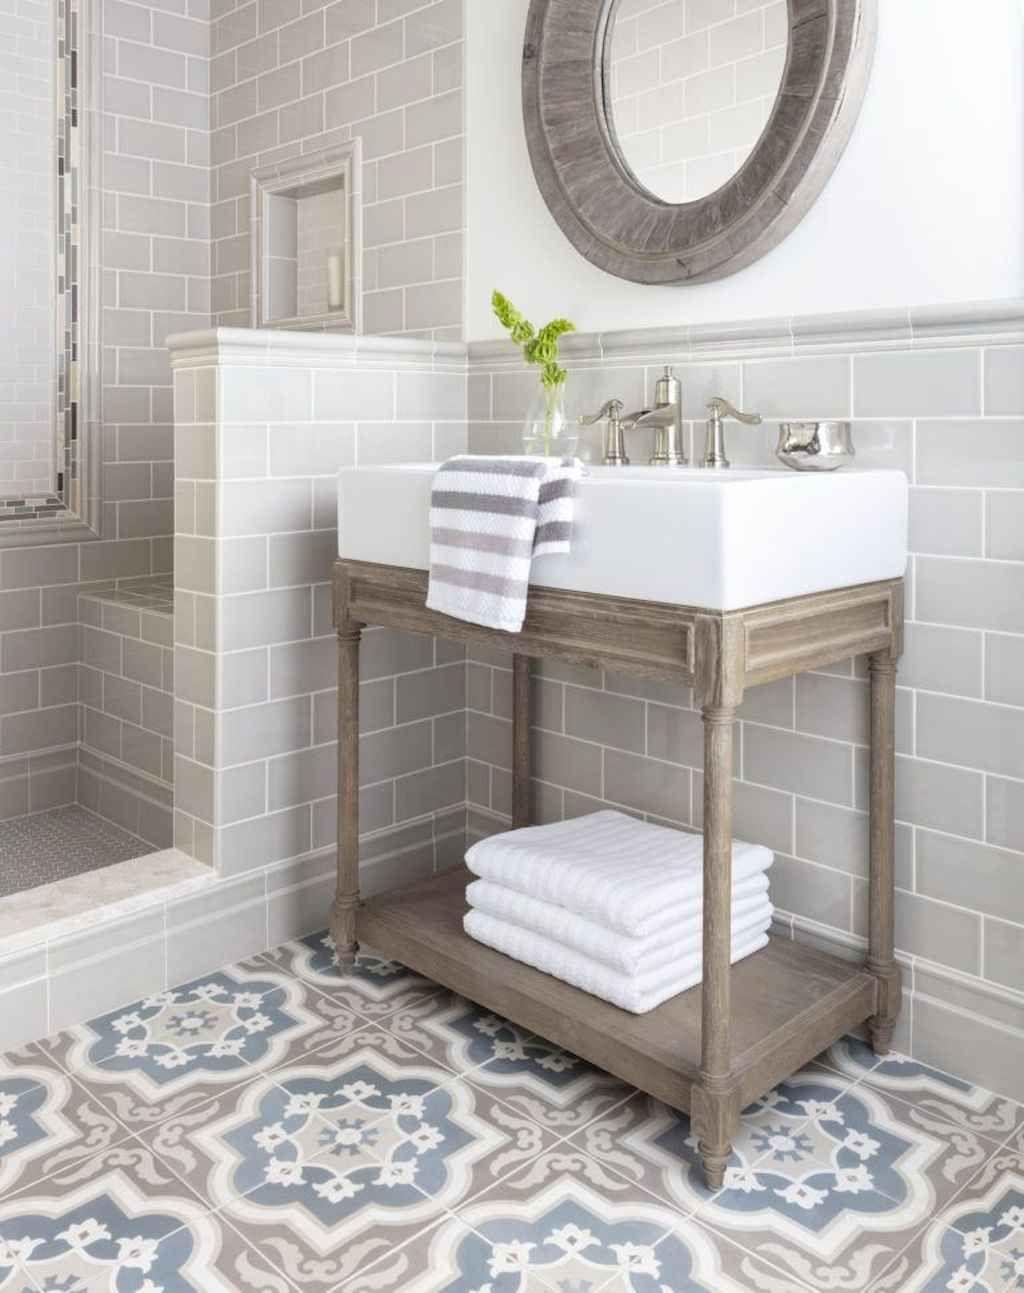 Photo of 60 farmhouse master bathroom remodel ideas – Gladecor.com